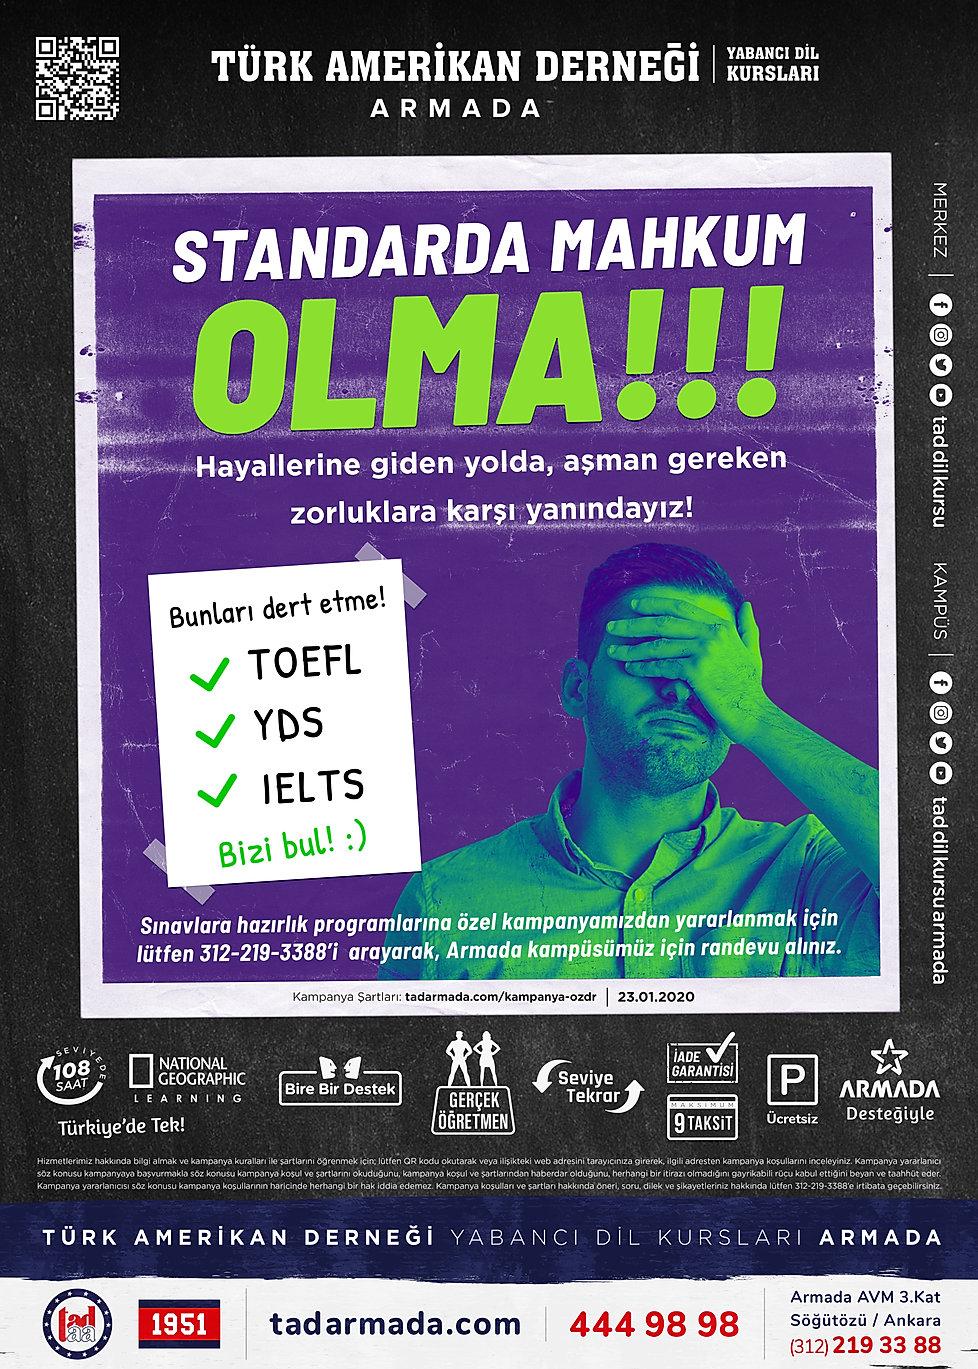 TAD YDK - Final Konsept - Standarda Mahk